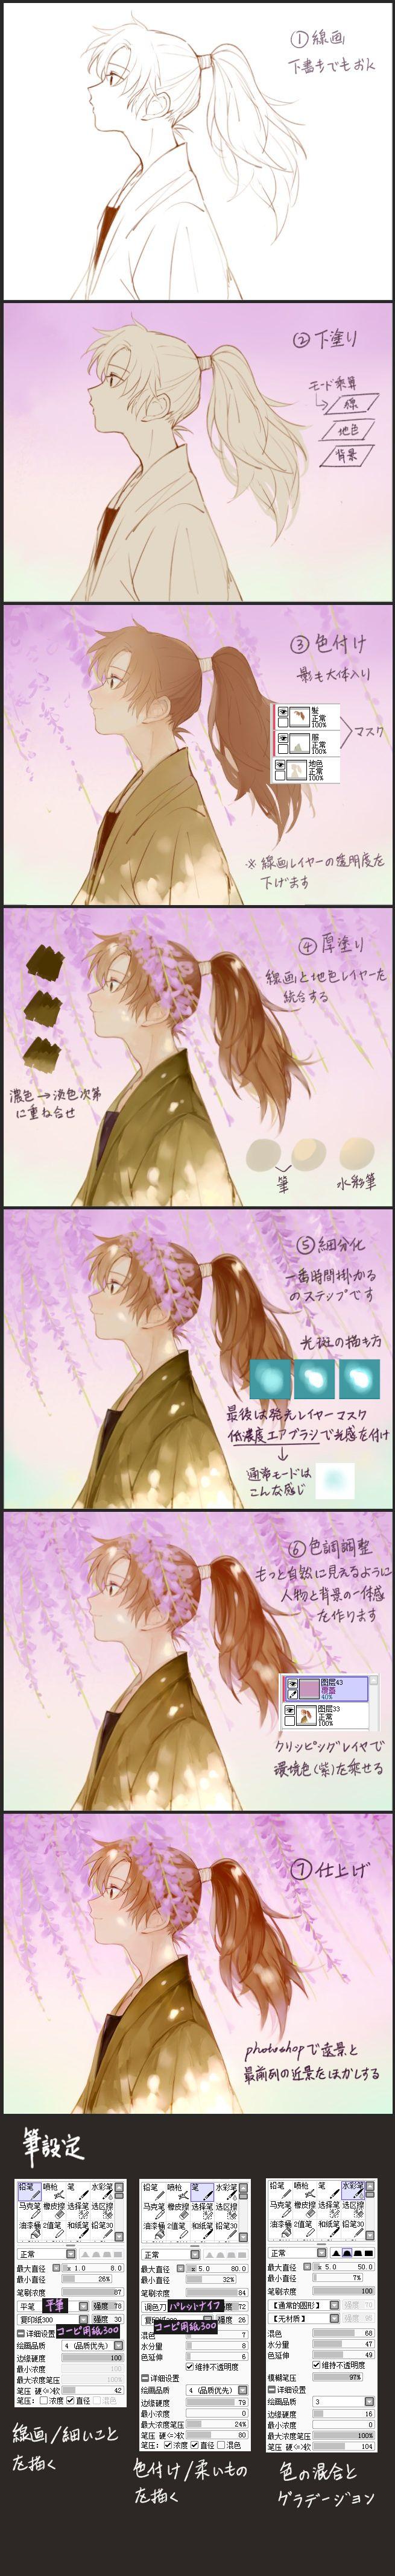 male in kimono lighting